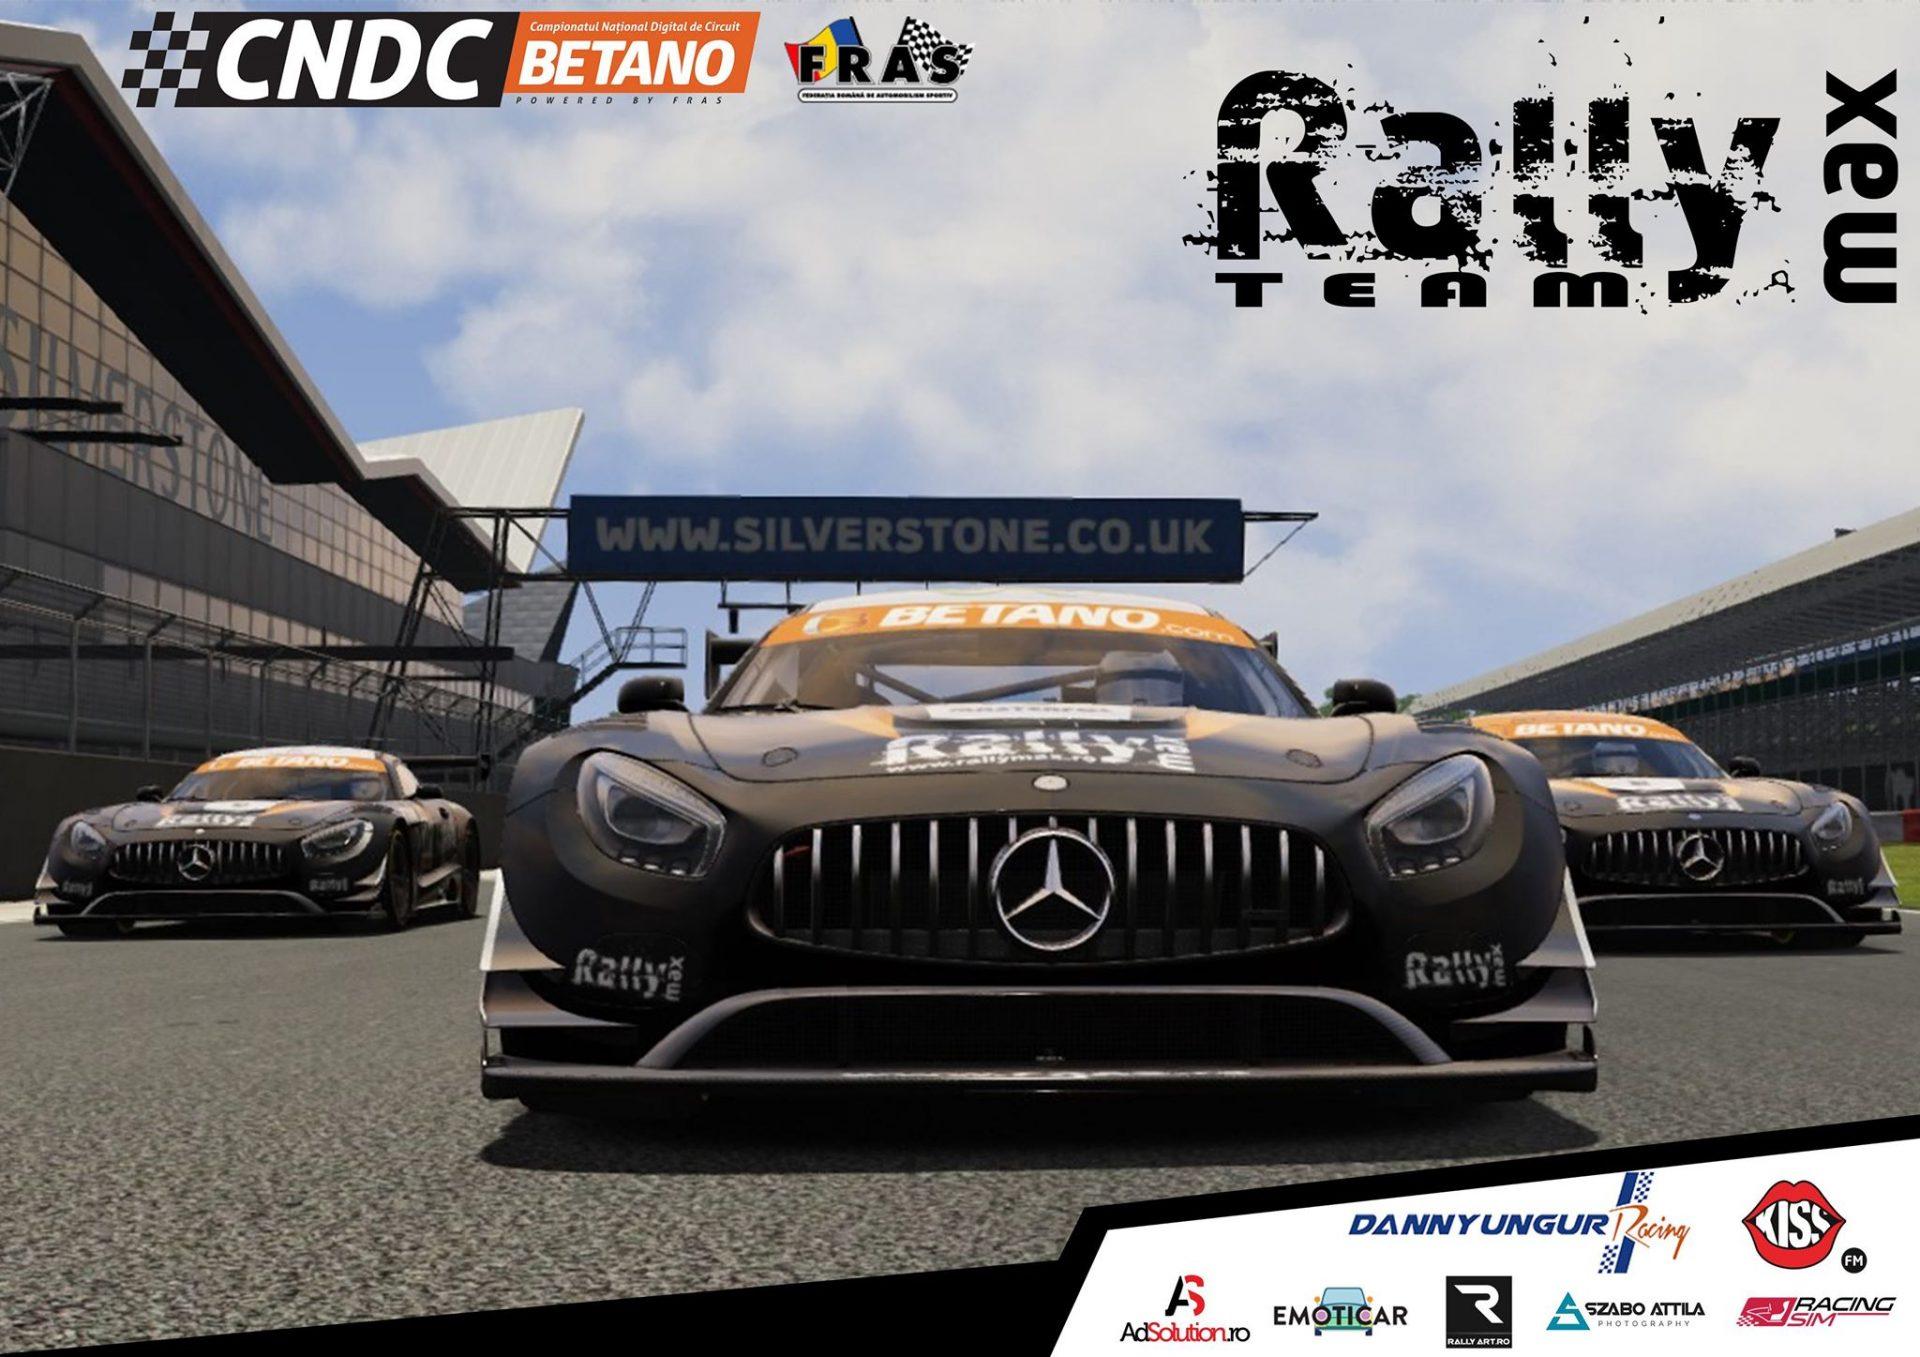 Echipa RallyMax concureaza in Campionatul National Digital pe Circuit 2020